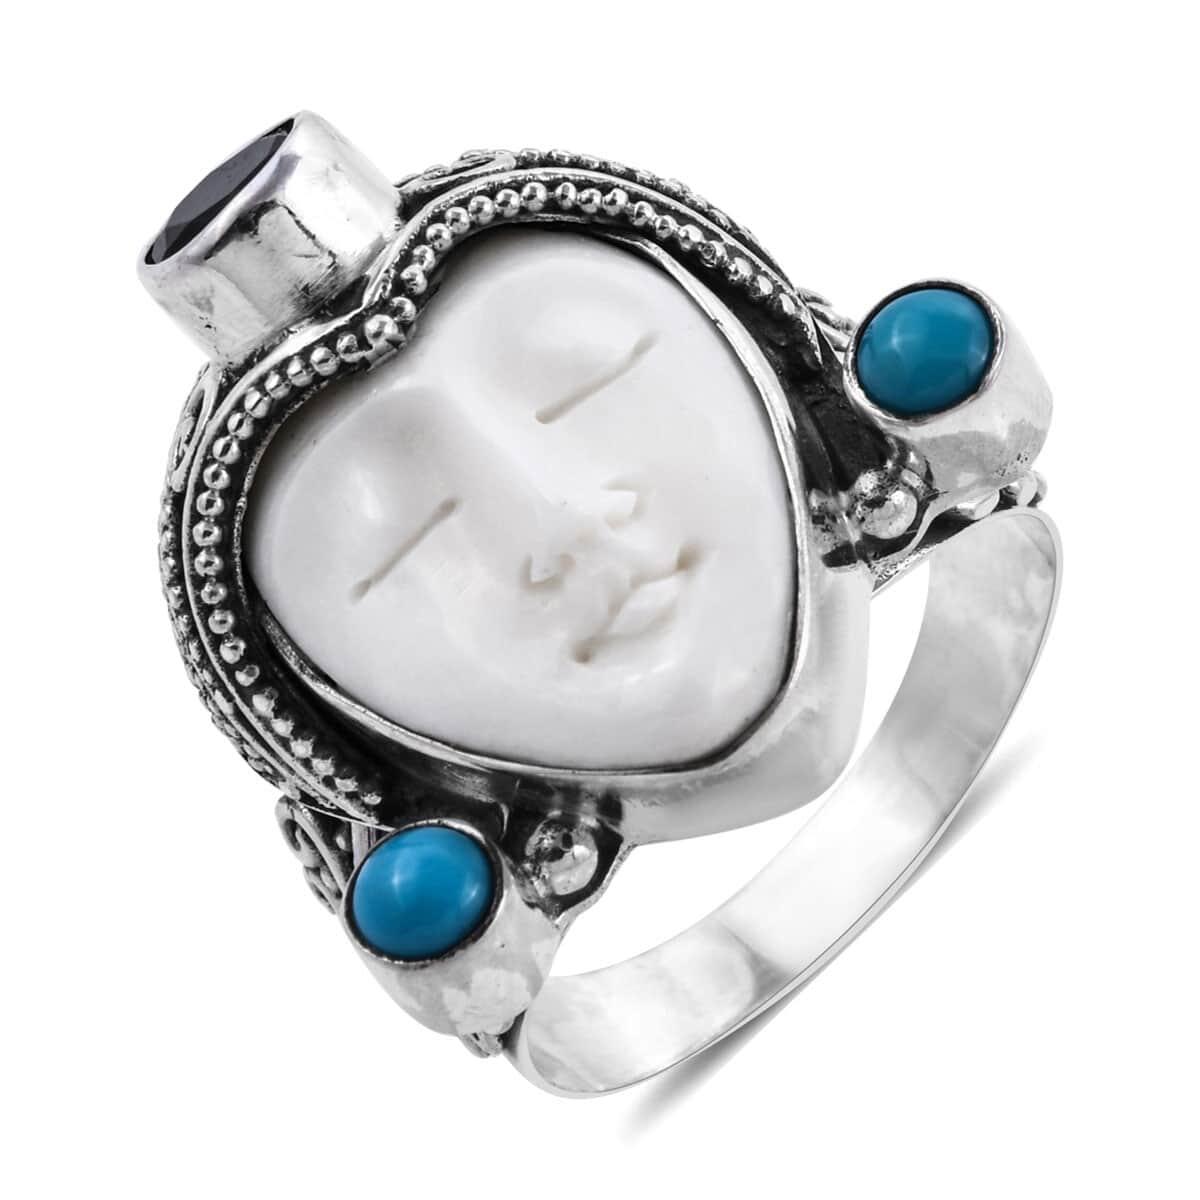 Bali Goddess Carved Bone Multi Gemstone Ring In Sterling Silver Size 9 0 Avg 11 91 G 1 45 Ctw Shop Lc